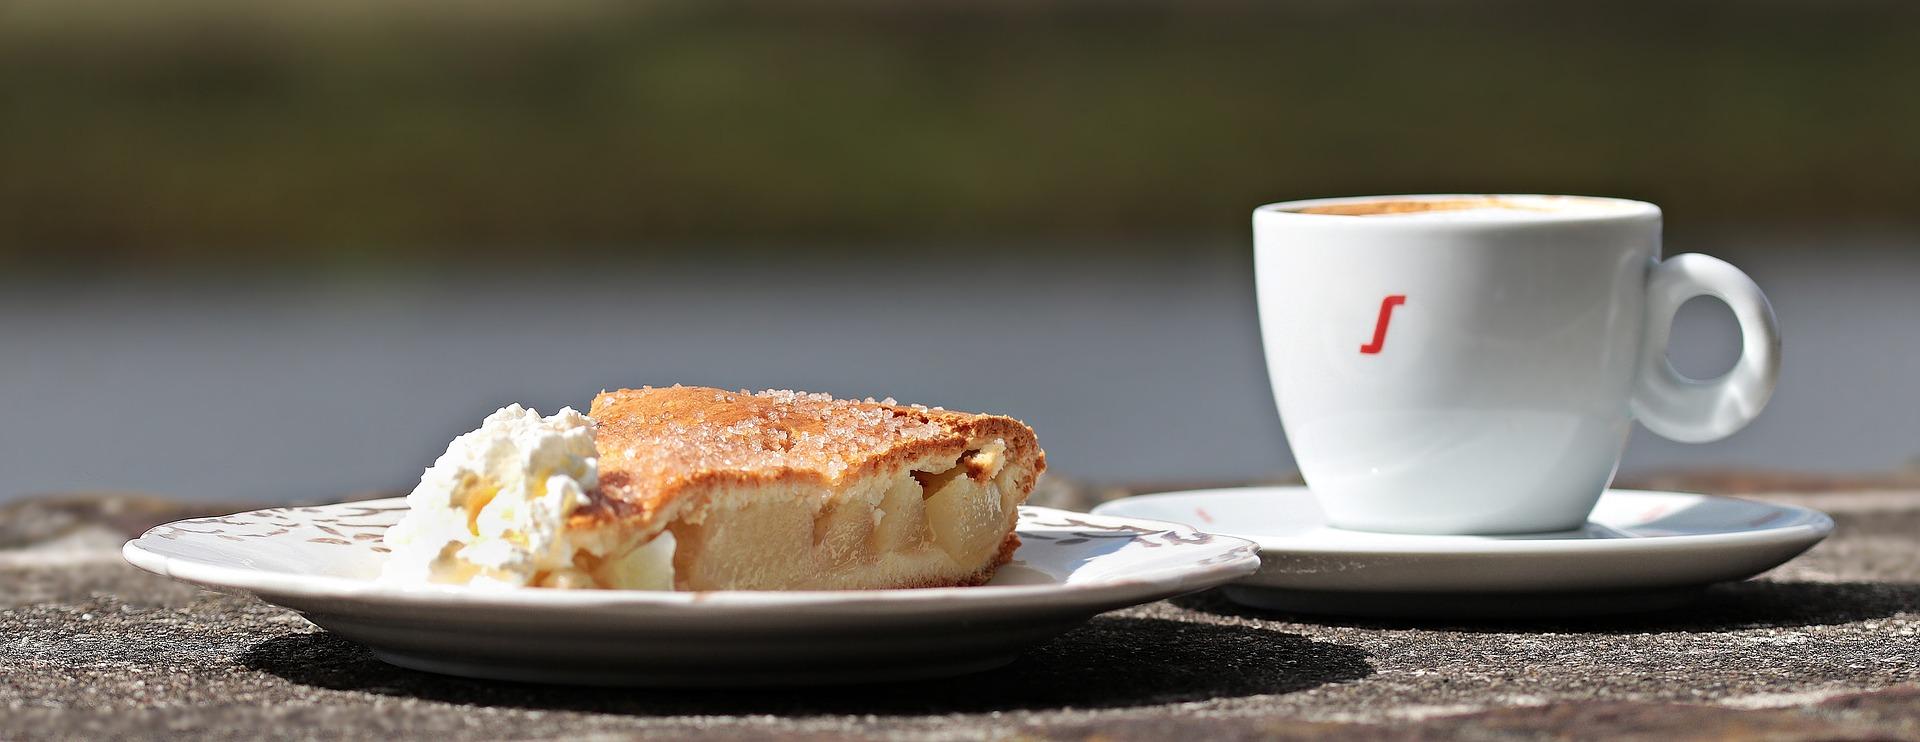 Coffee and cake pixabay